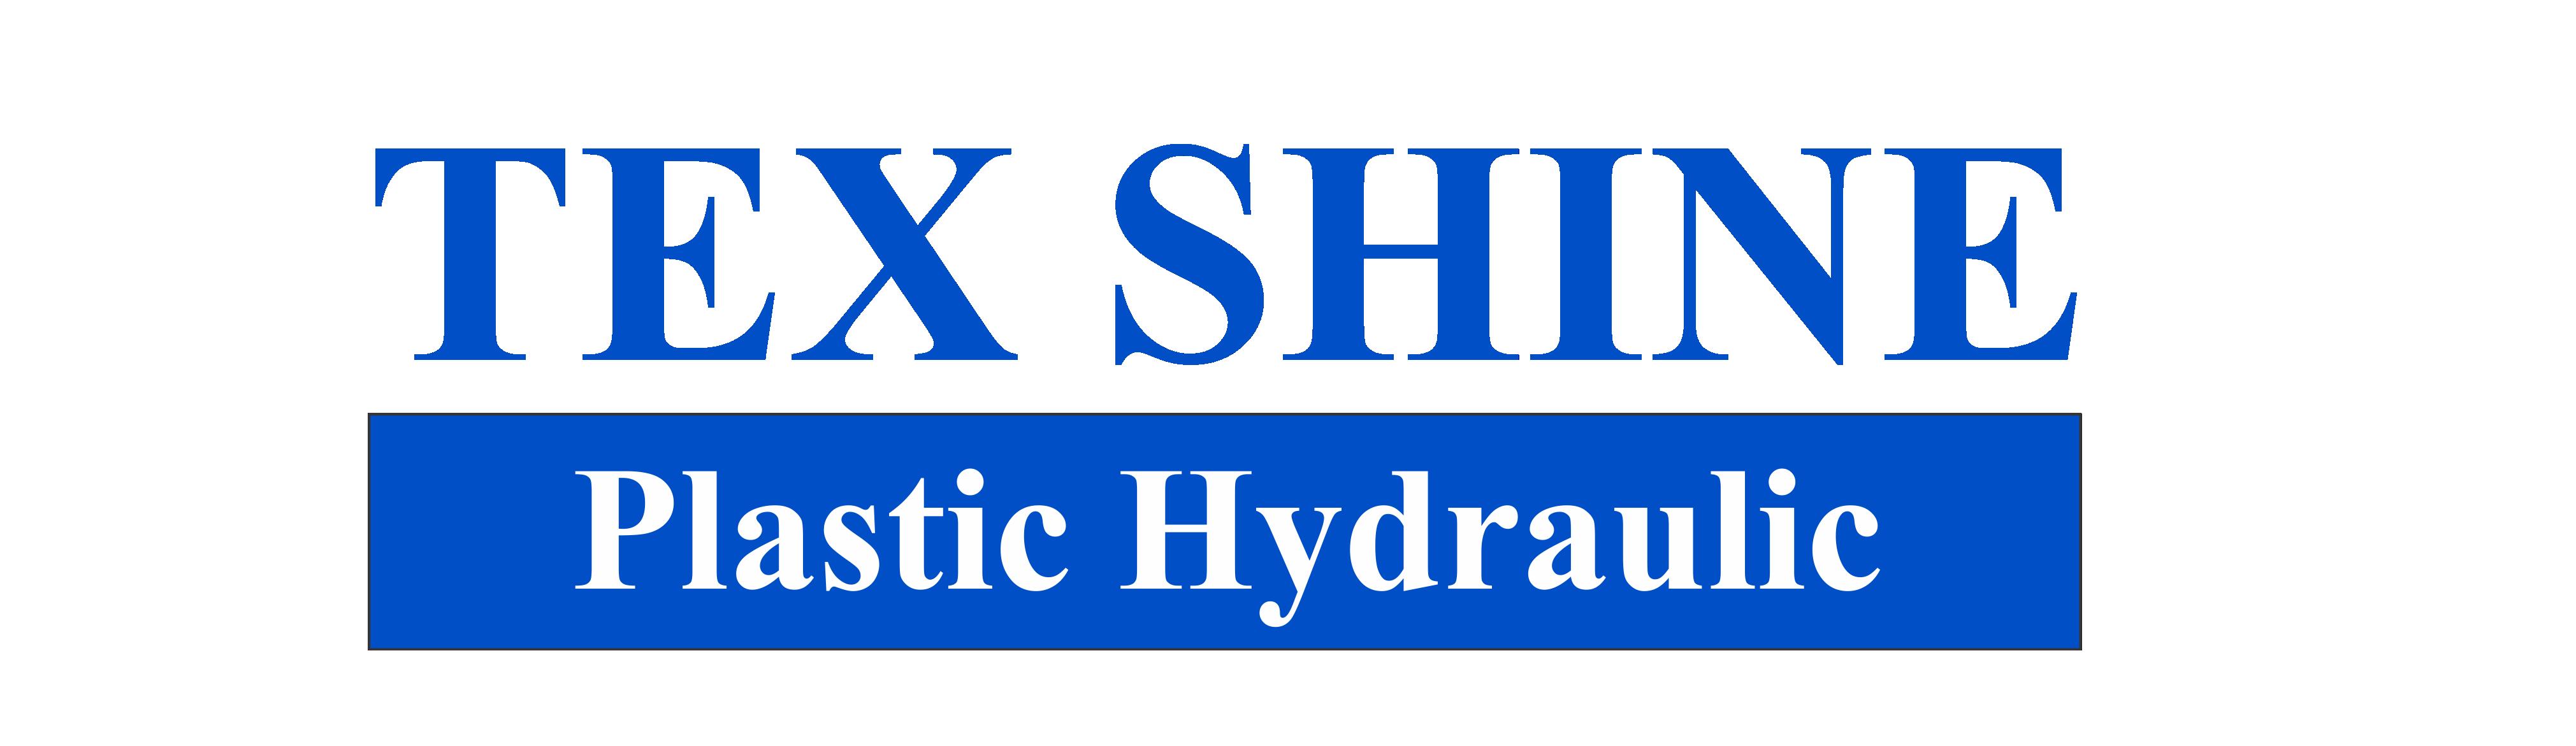 http://www.texshine.in/Tex Shine Plastic Hydraulic